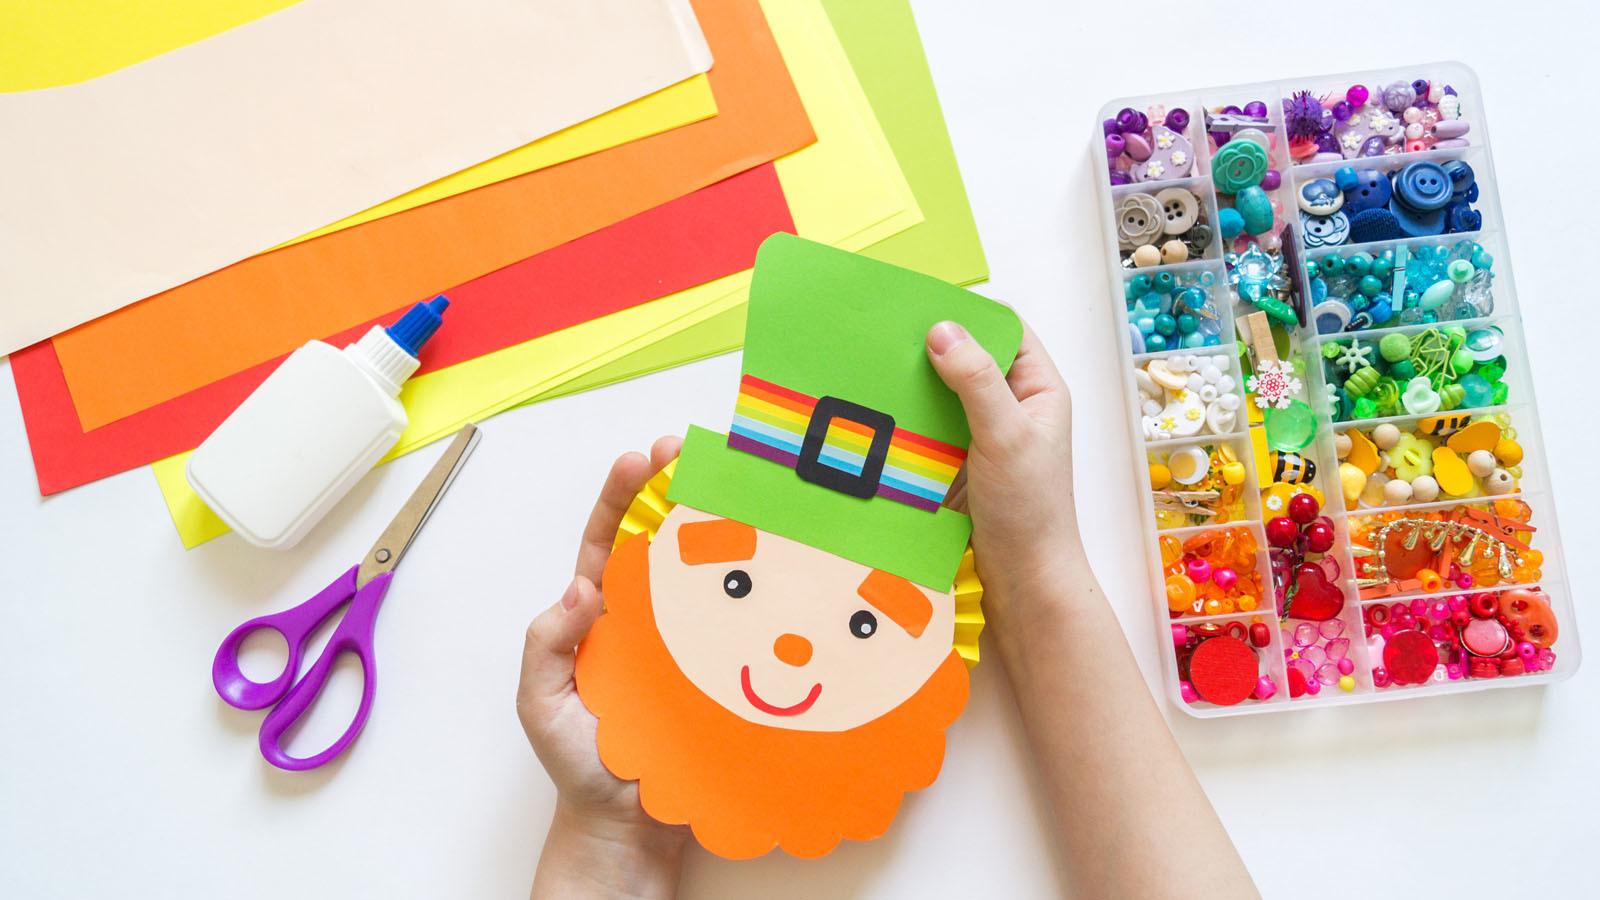 St. Patrick's Day Classroom Activities: 5 Fun Ways to Celebrate